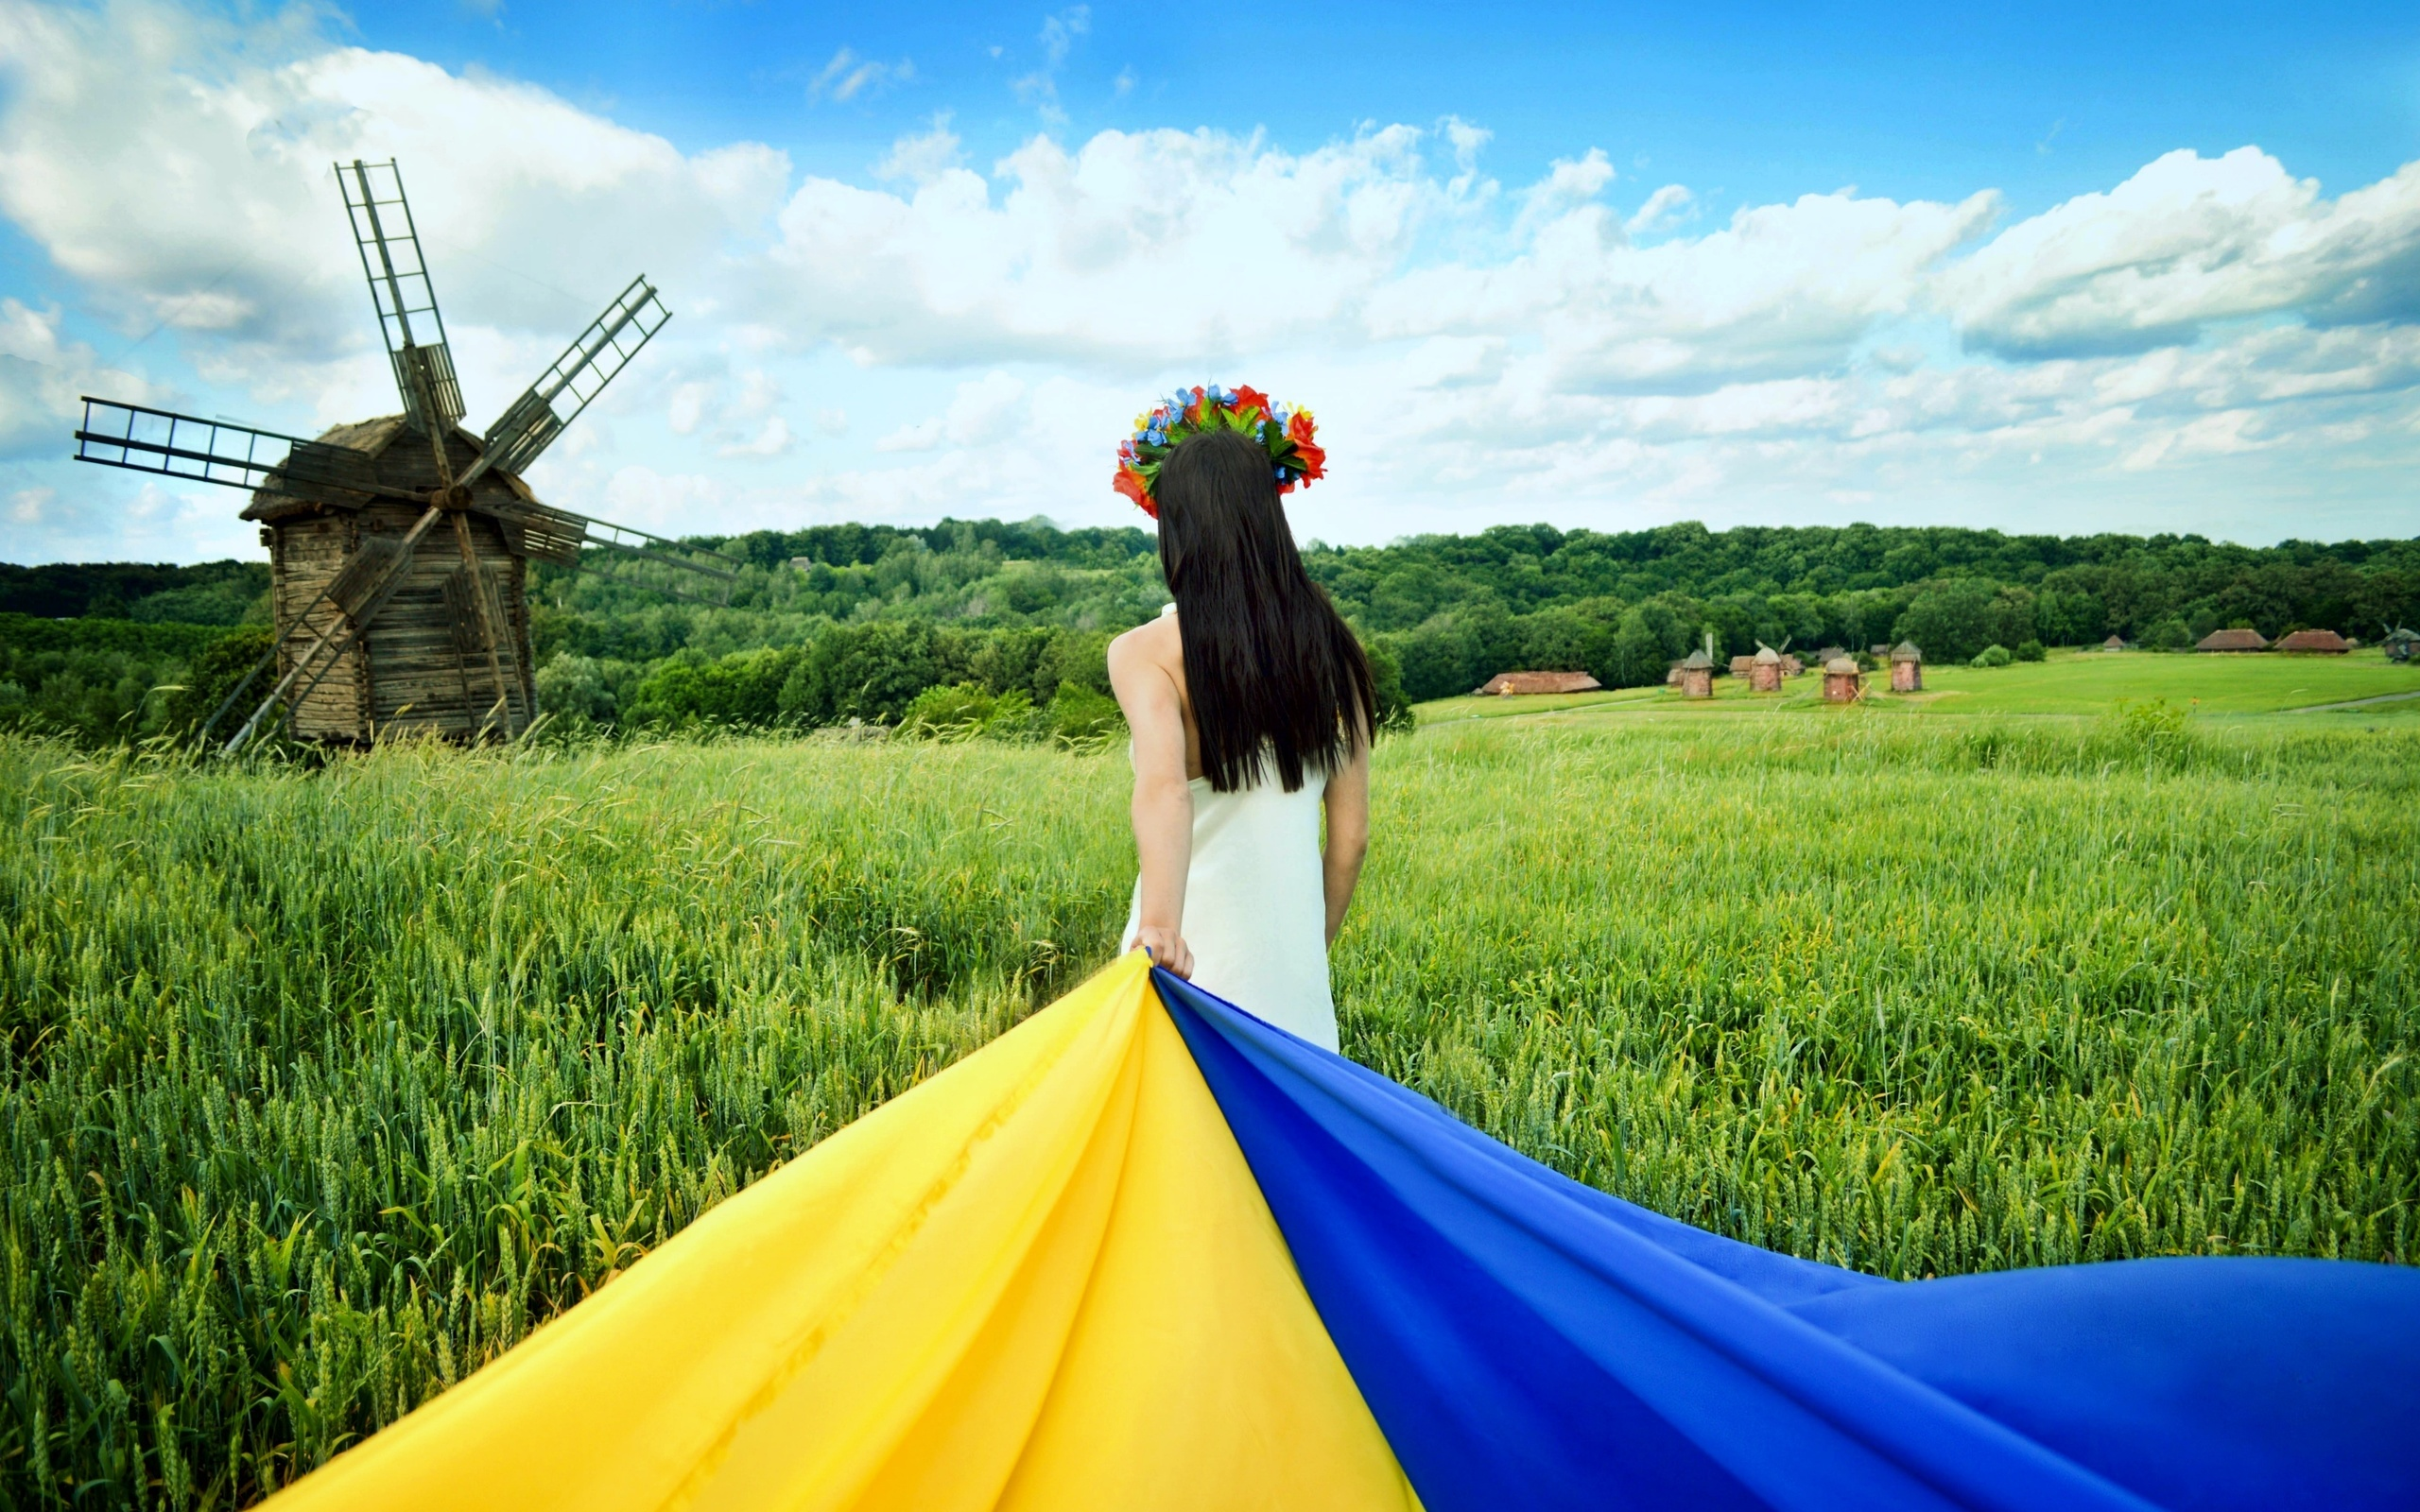 Утро картинки, украинские картинки с надписями